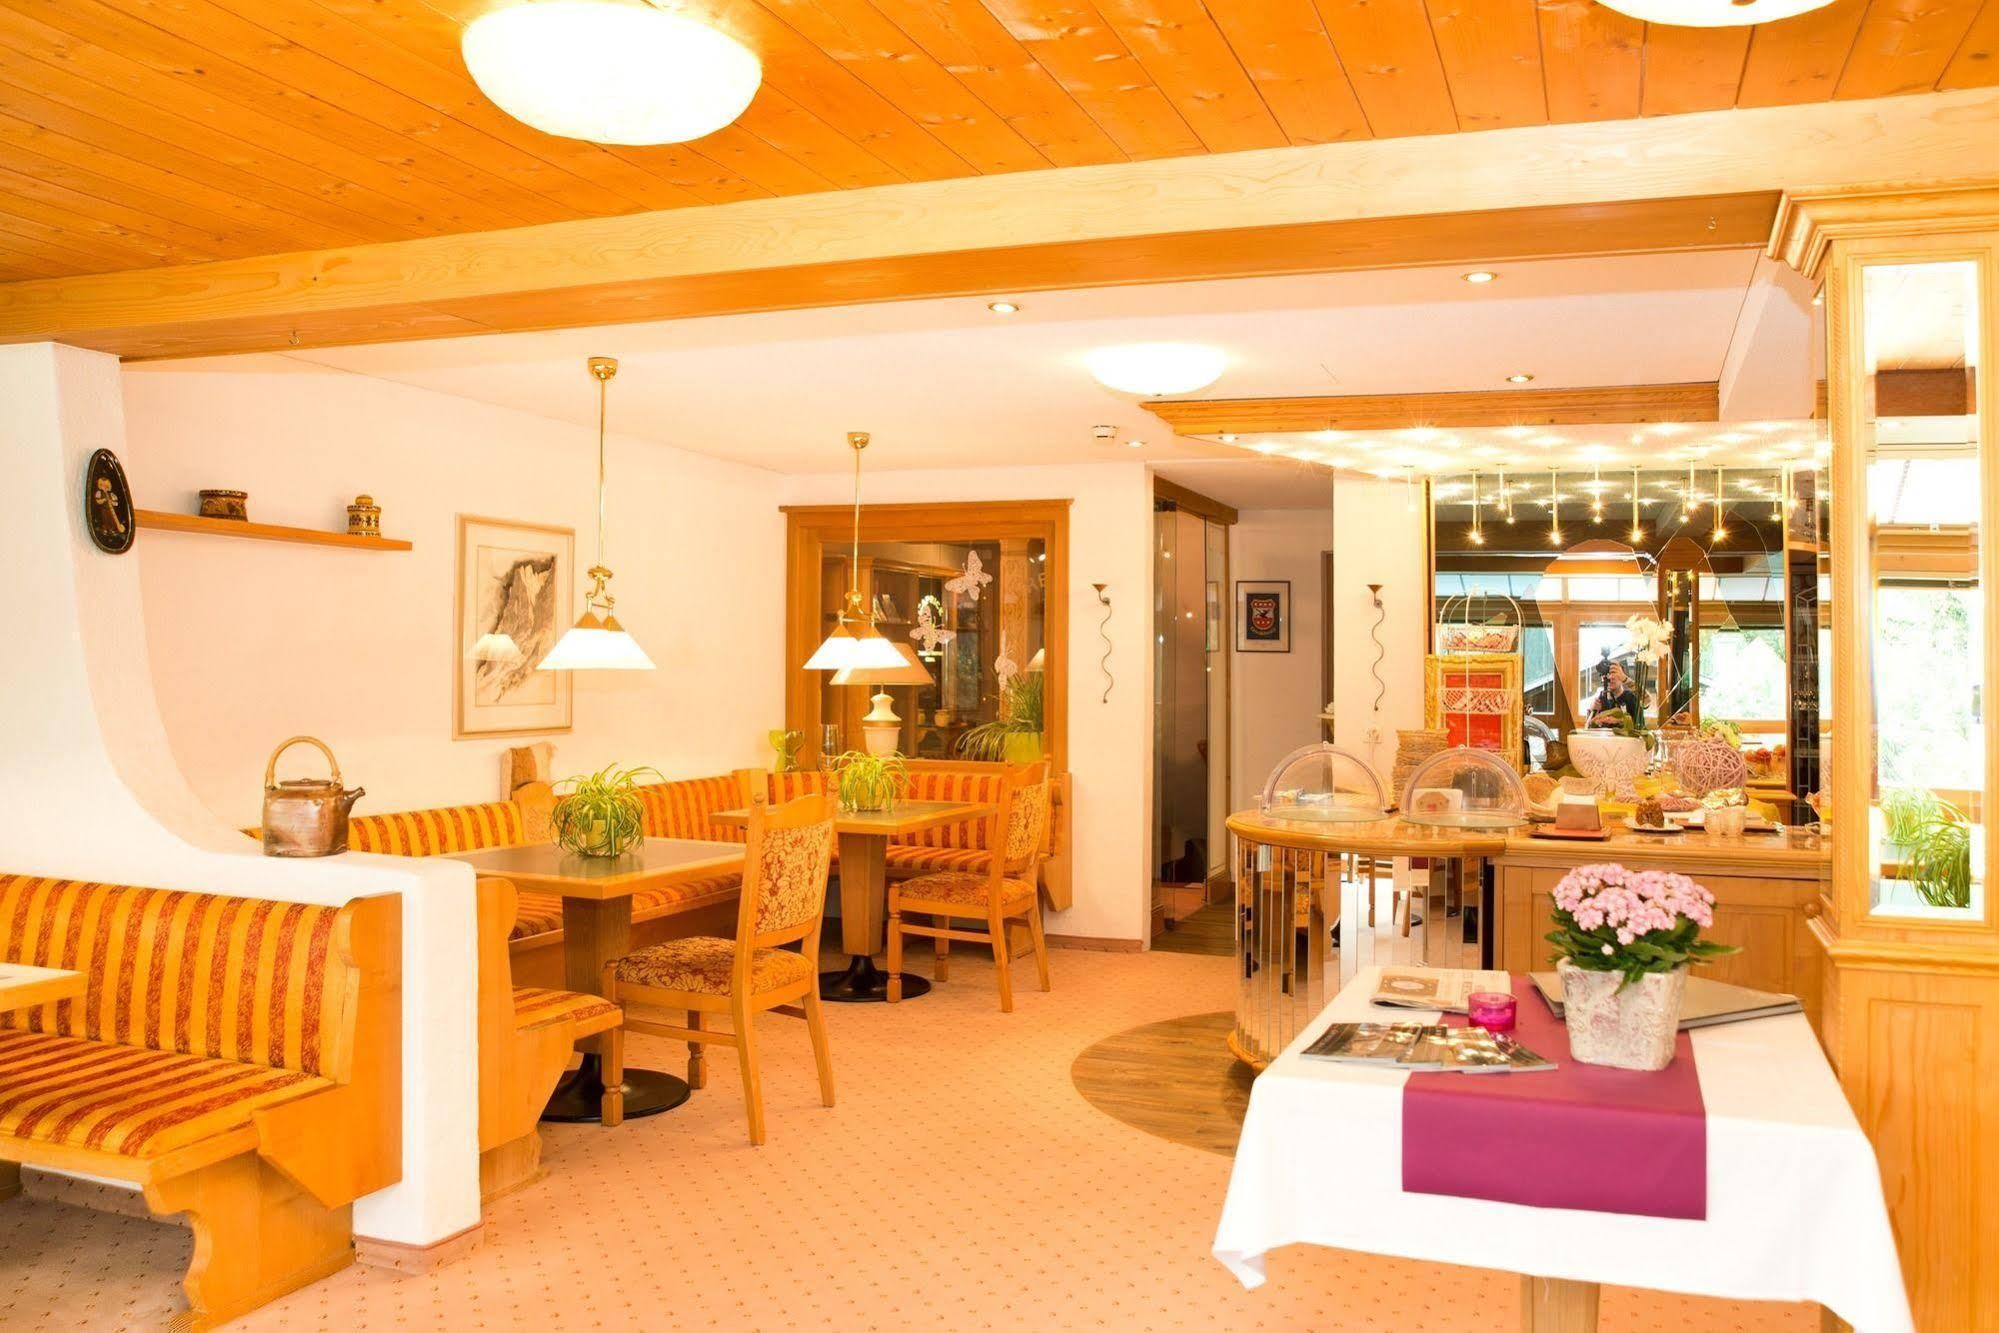 Hotel Caprice - Grindelwald, Interlaken